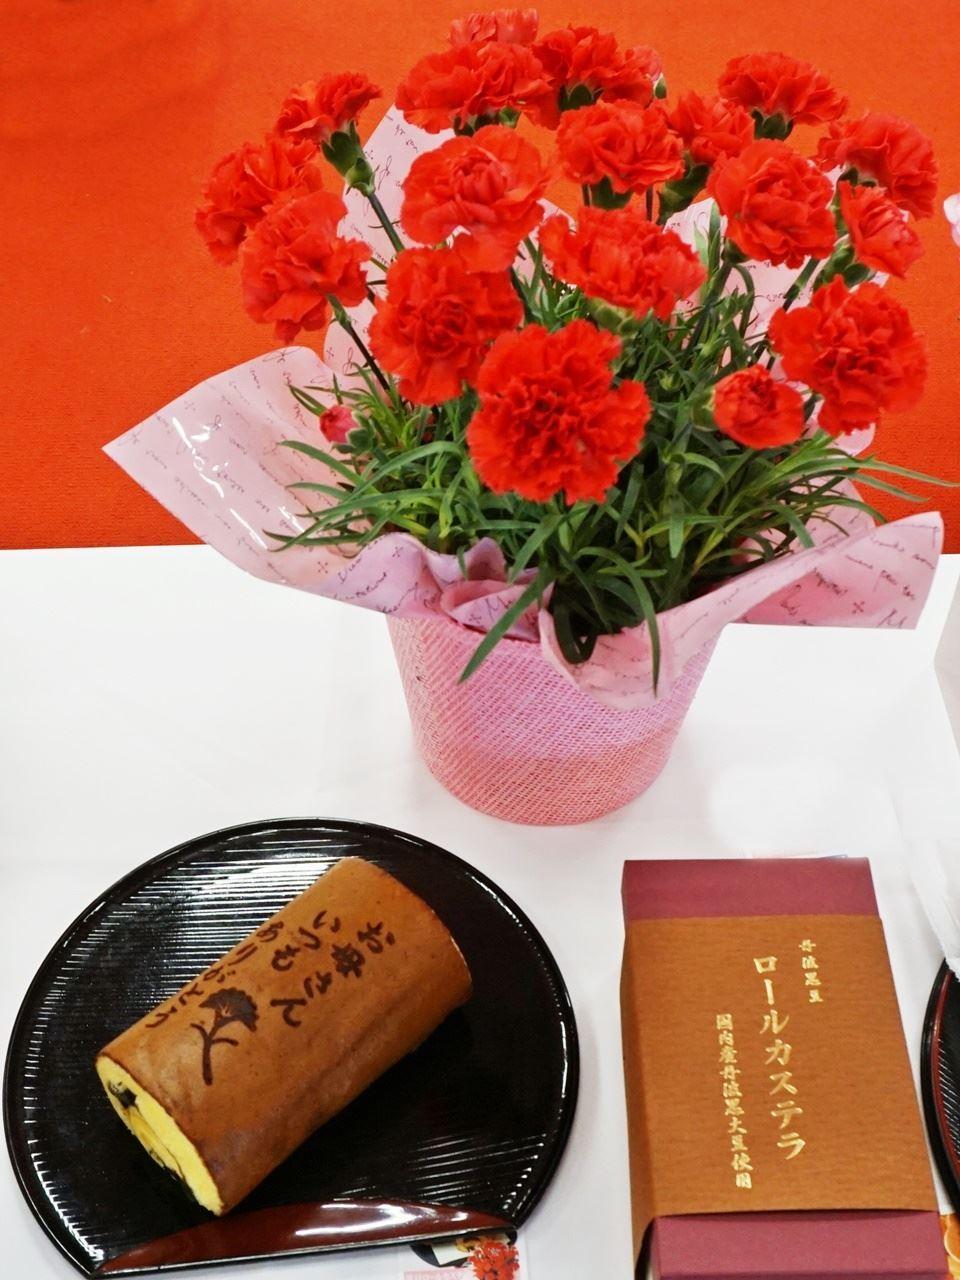 【e87】母の日 鉢植えセット「京・伏見 三源庵 黒豆ロールカステラ」